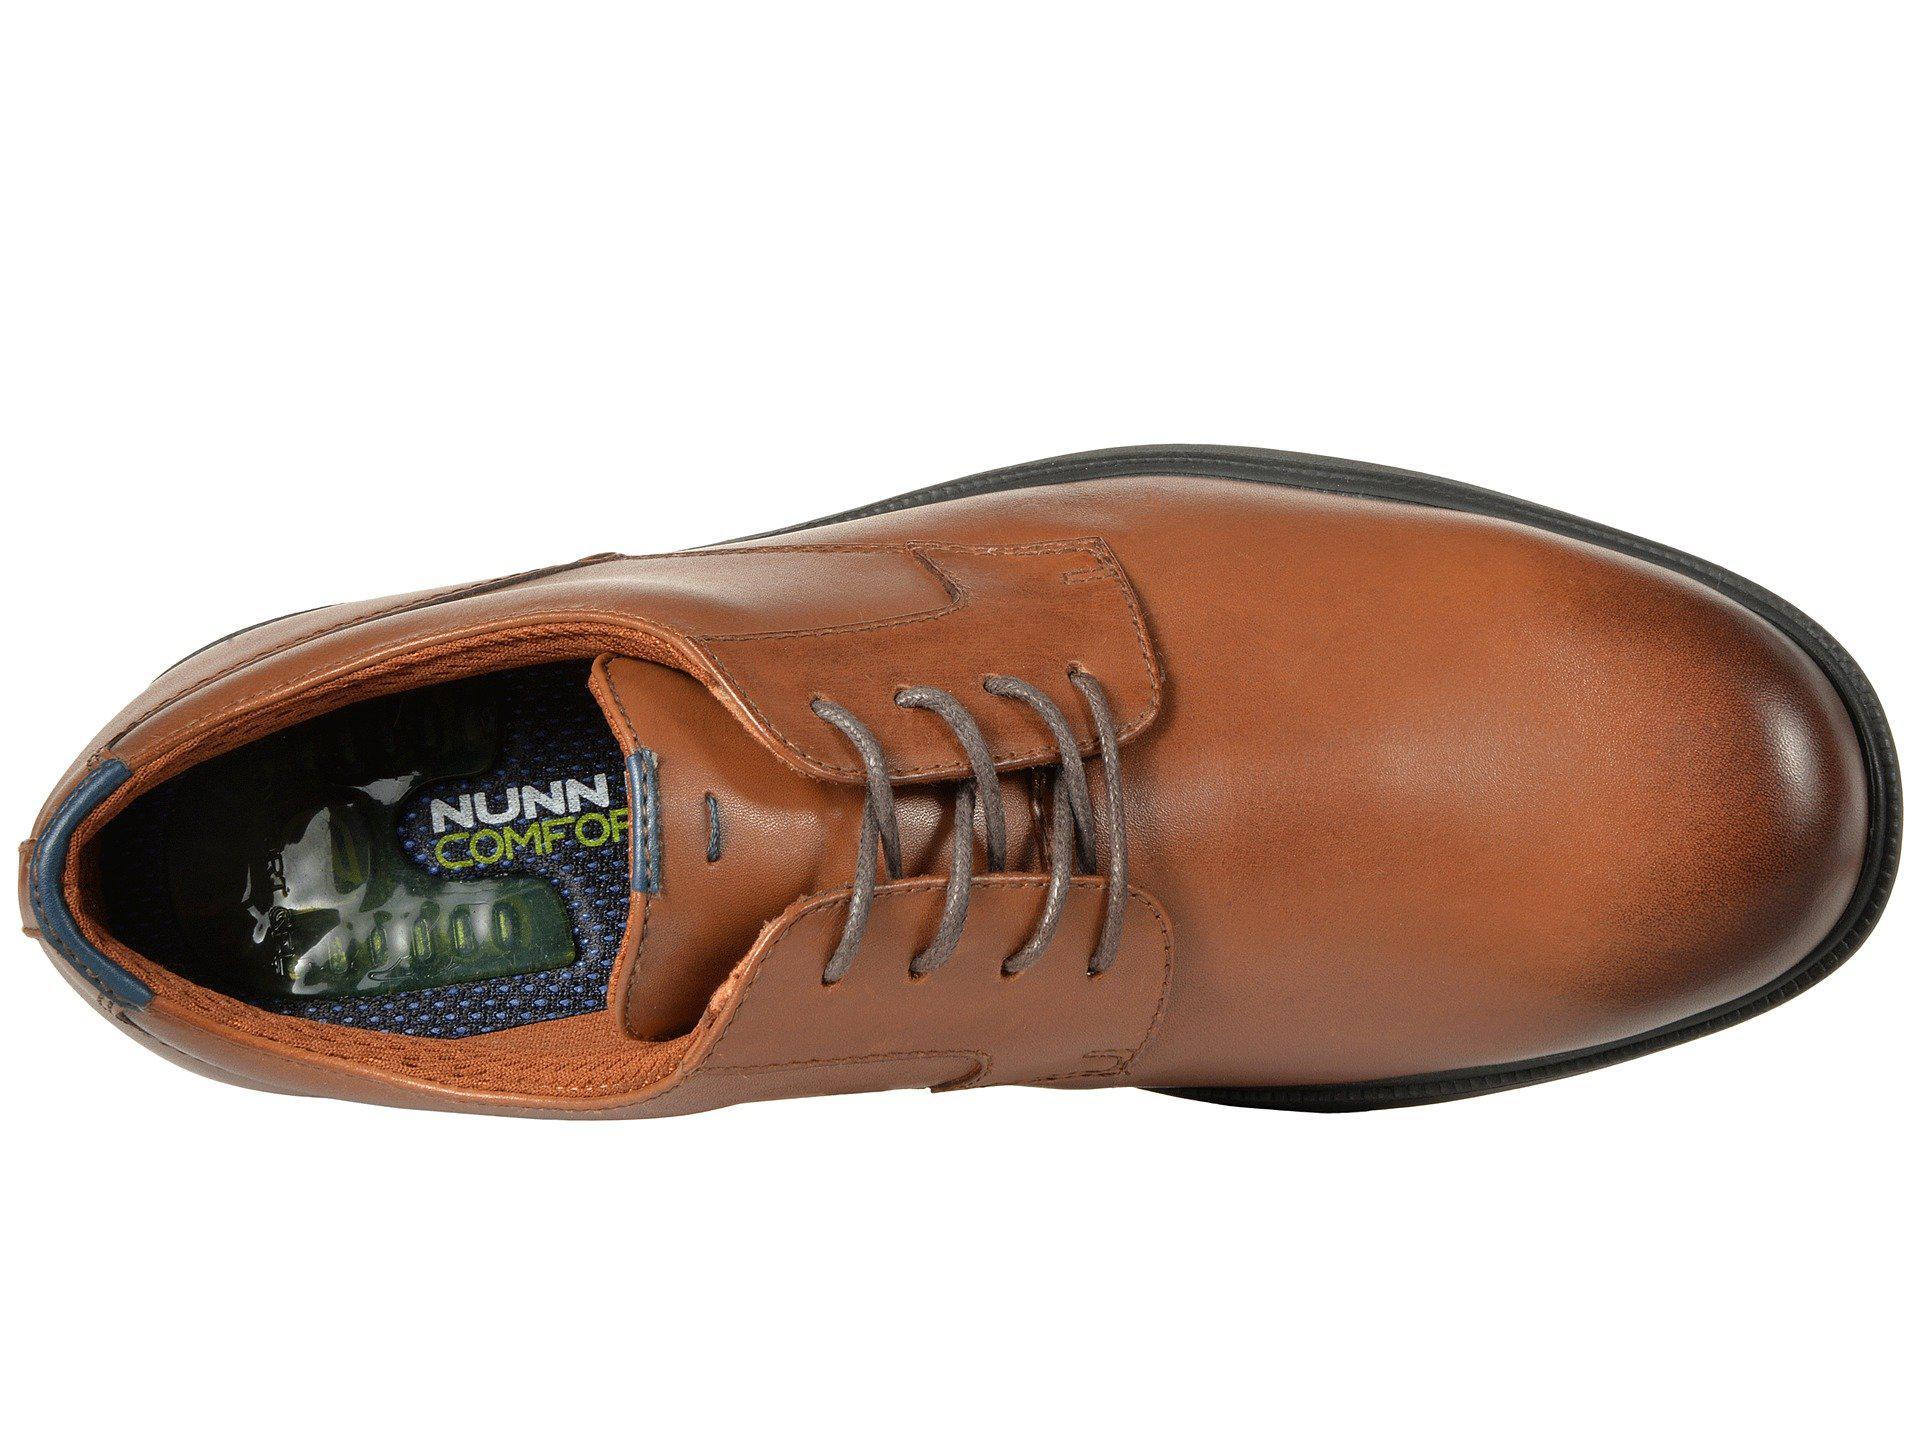 6ce669945 Nunn Bush - Brown Marvin Street Plain Toe Oxford With Kore Slip Resistant  Walking Comfort Technology. View fullscreen